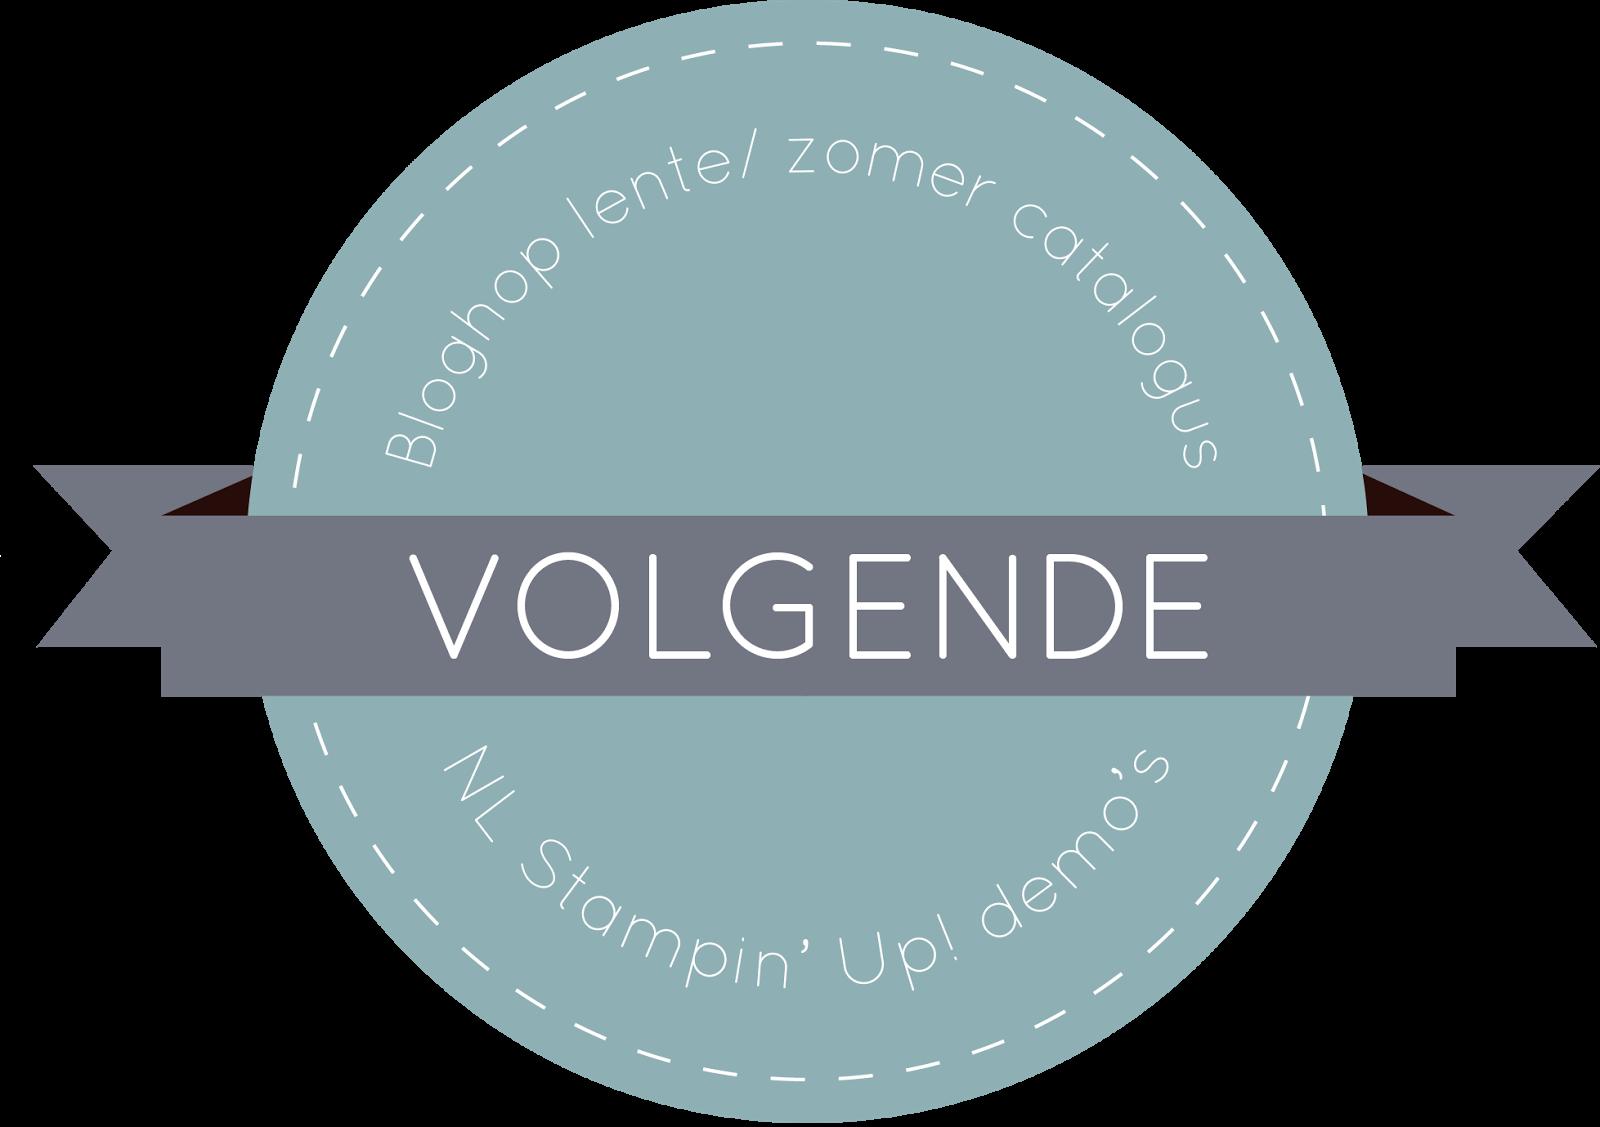 http://koefje.blogspot.nl